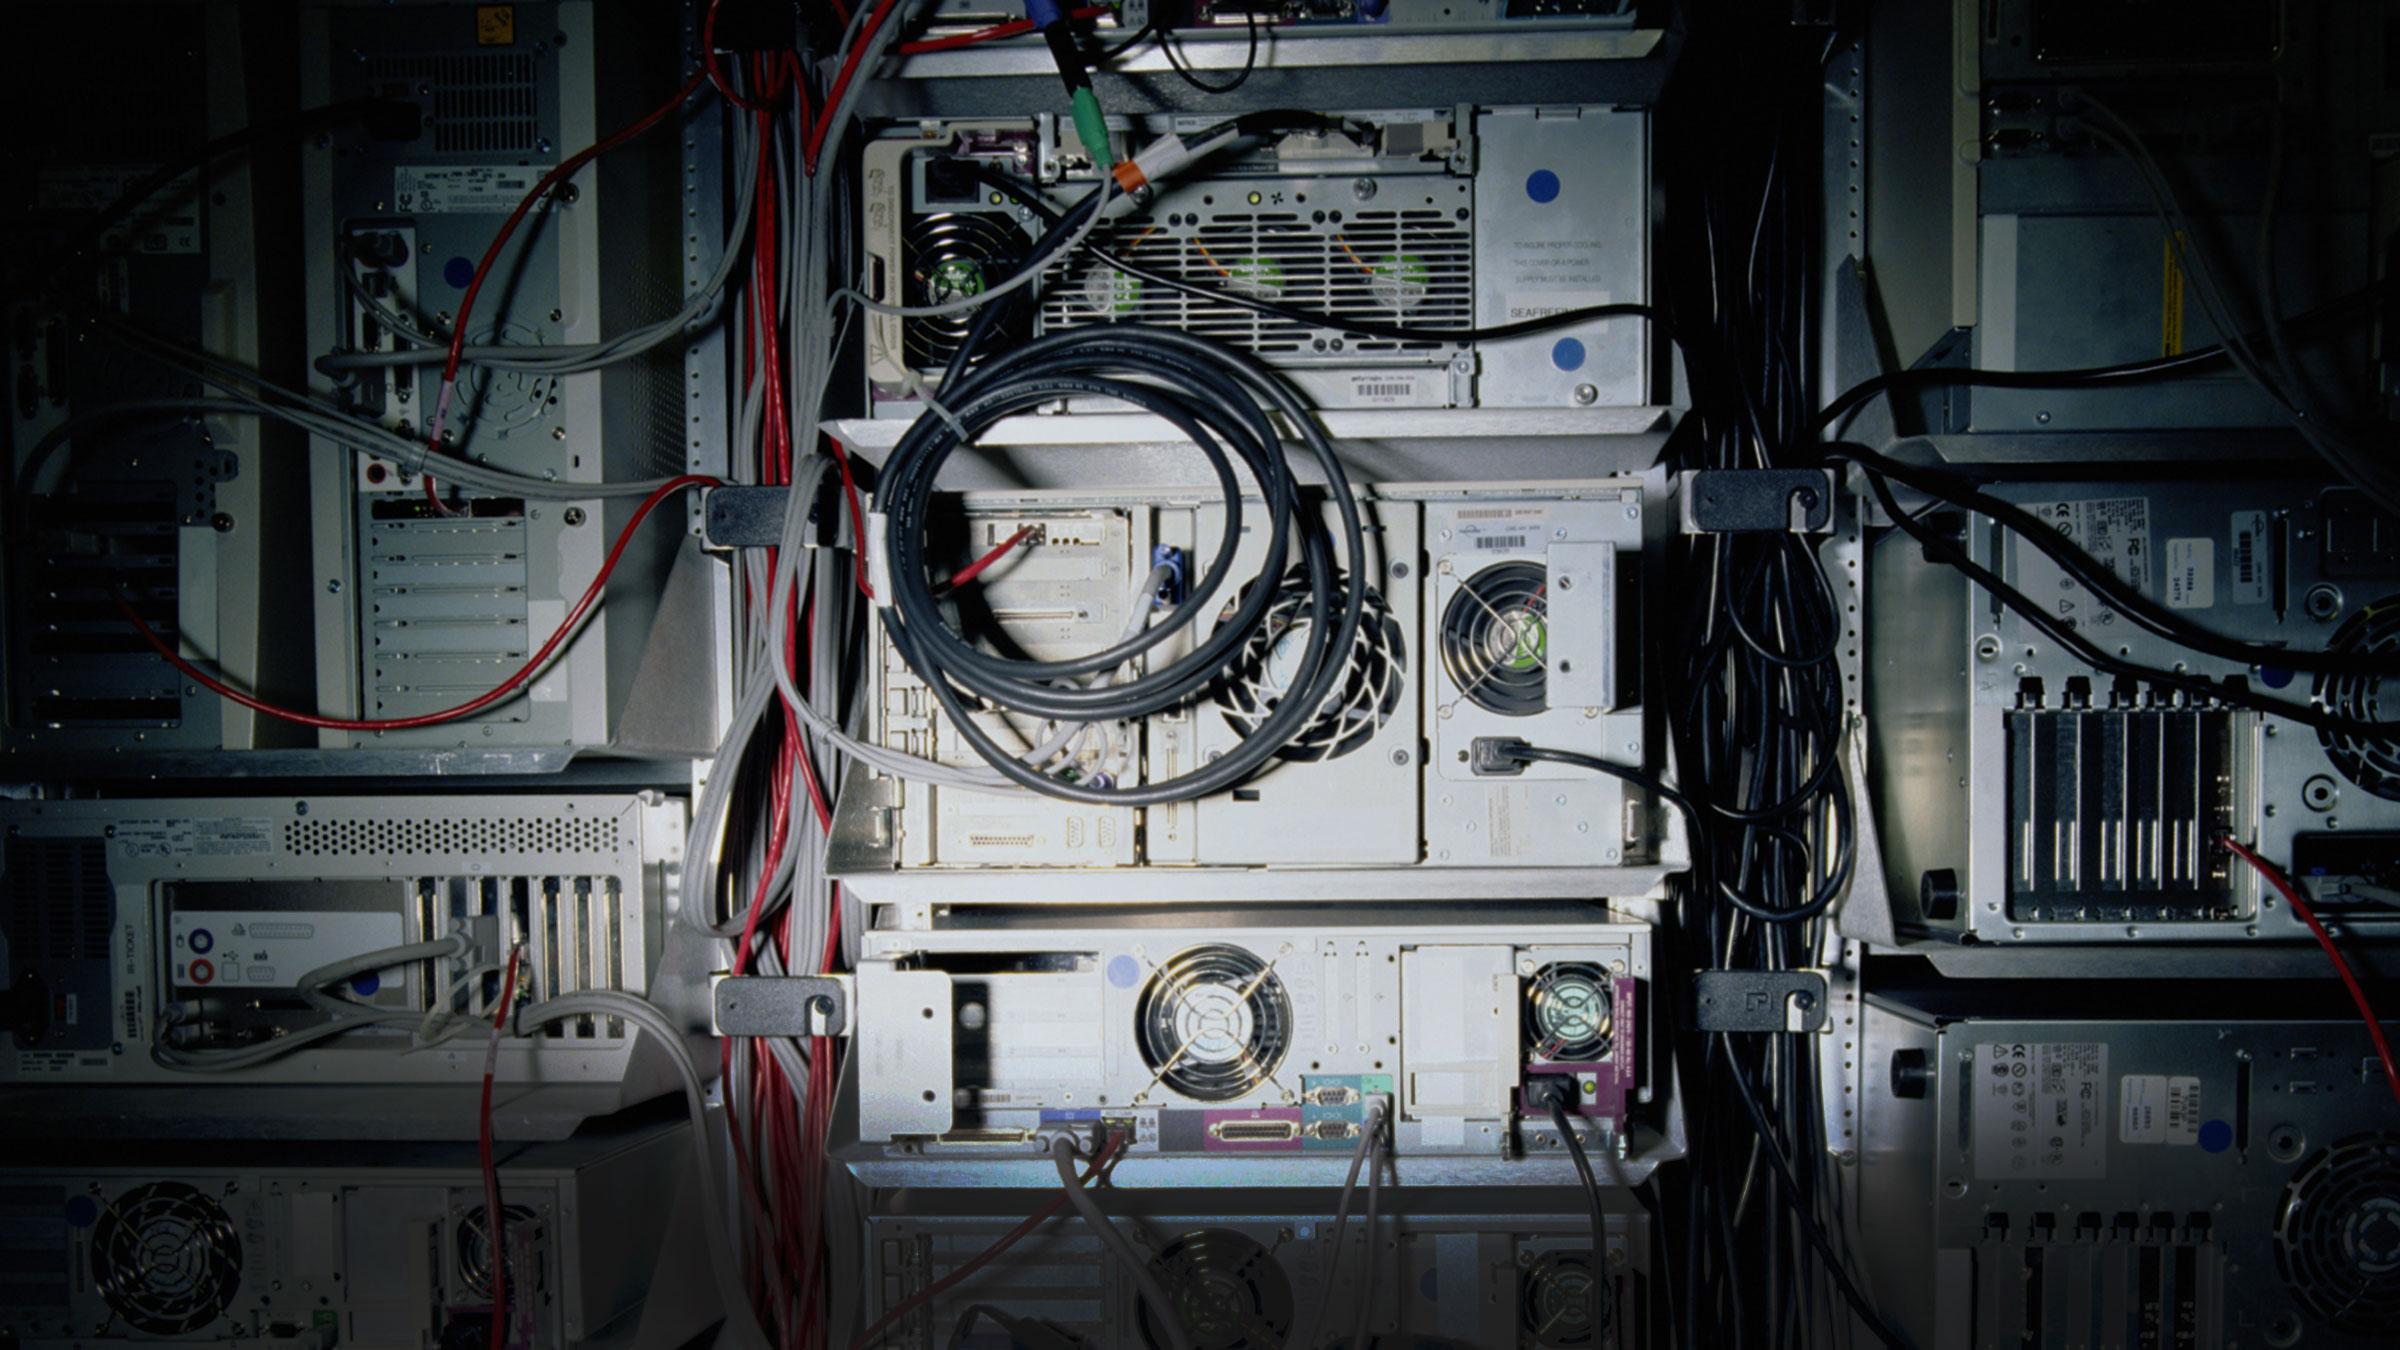 network-server-10052012-web